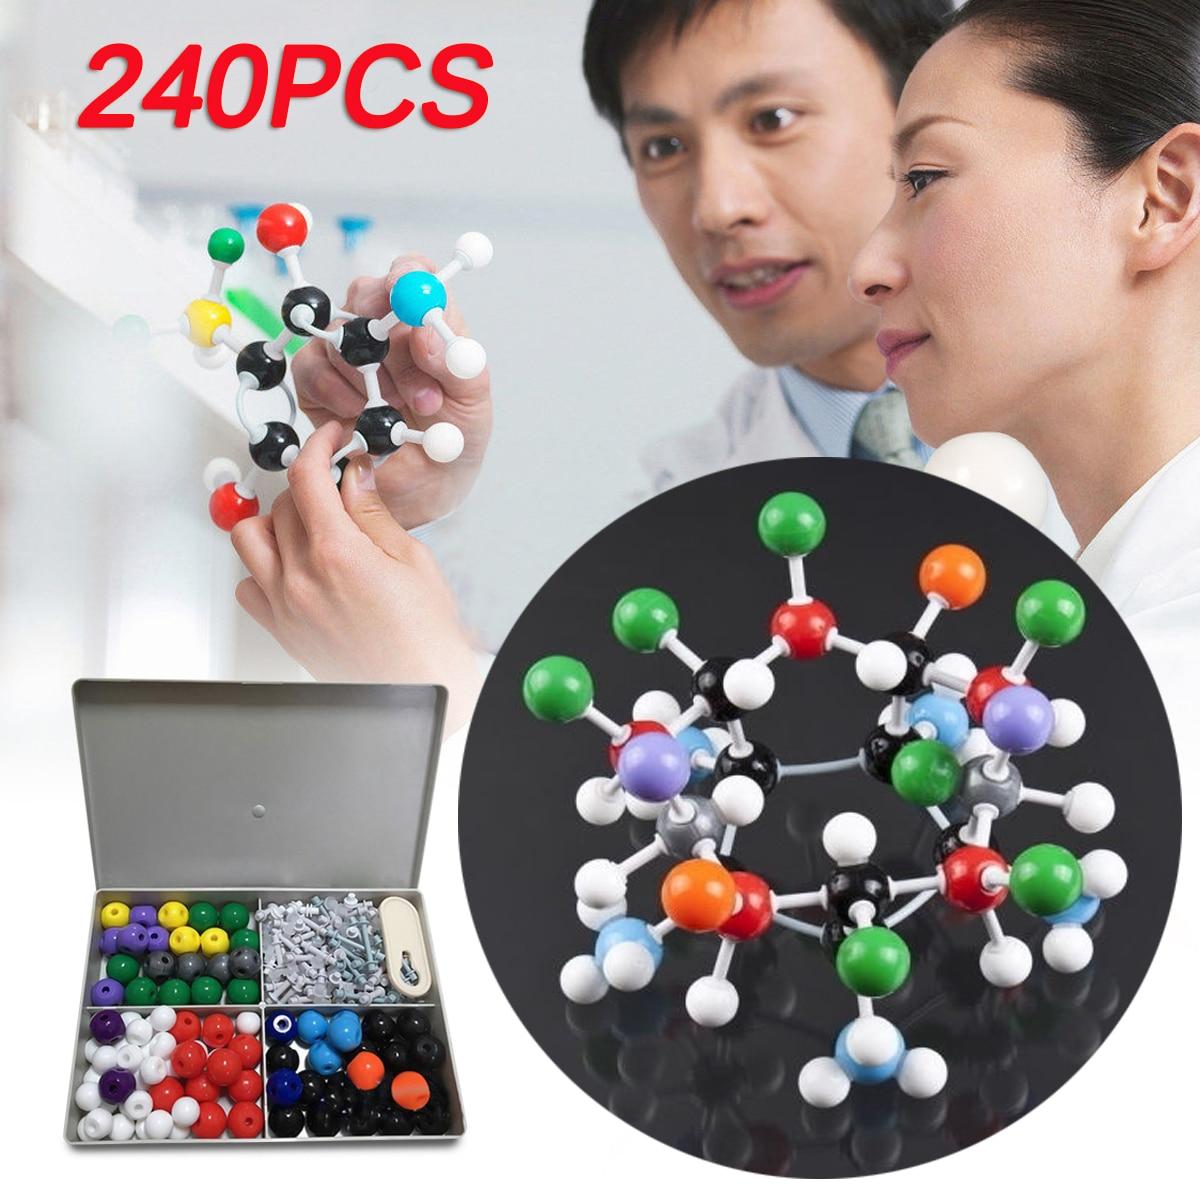 240Pcs Molecular Model Set Kit General and Organic Chemistry Atom Bonds Student Set For School Lab Teaching Research